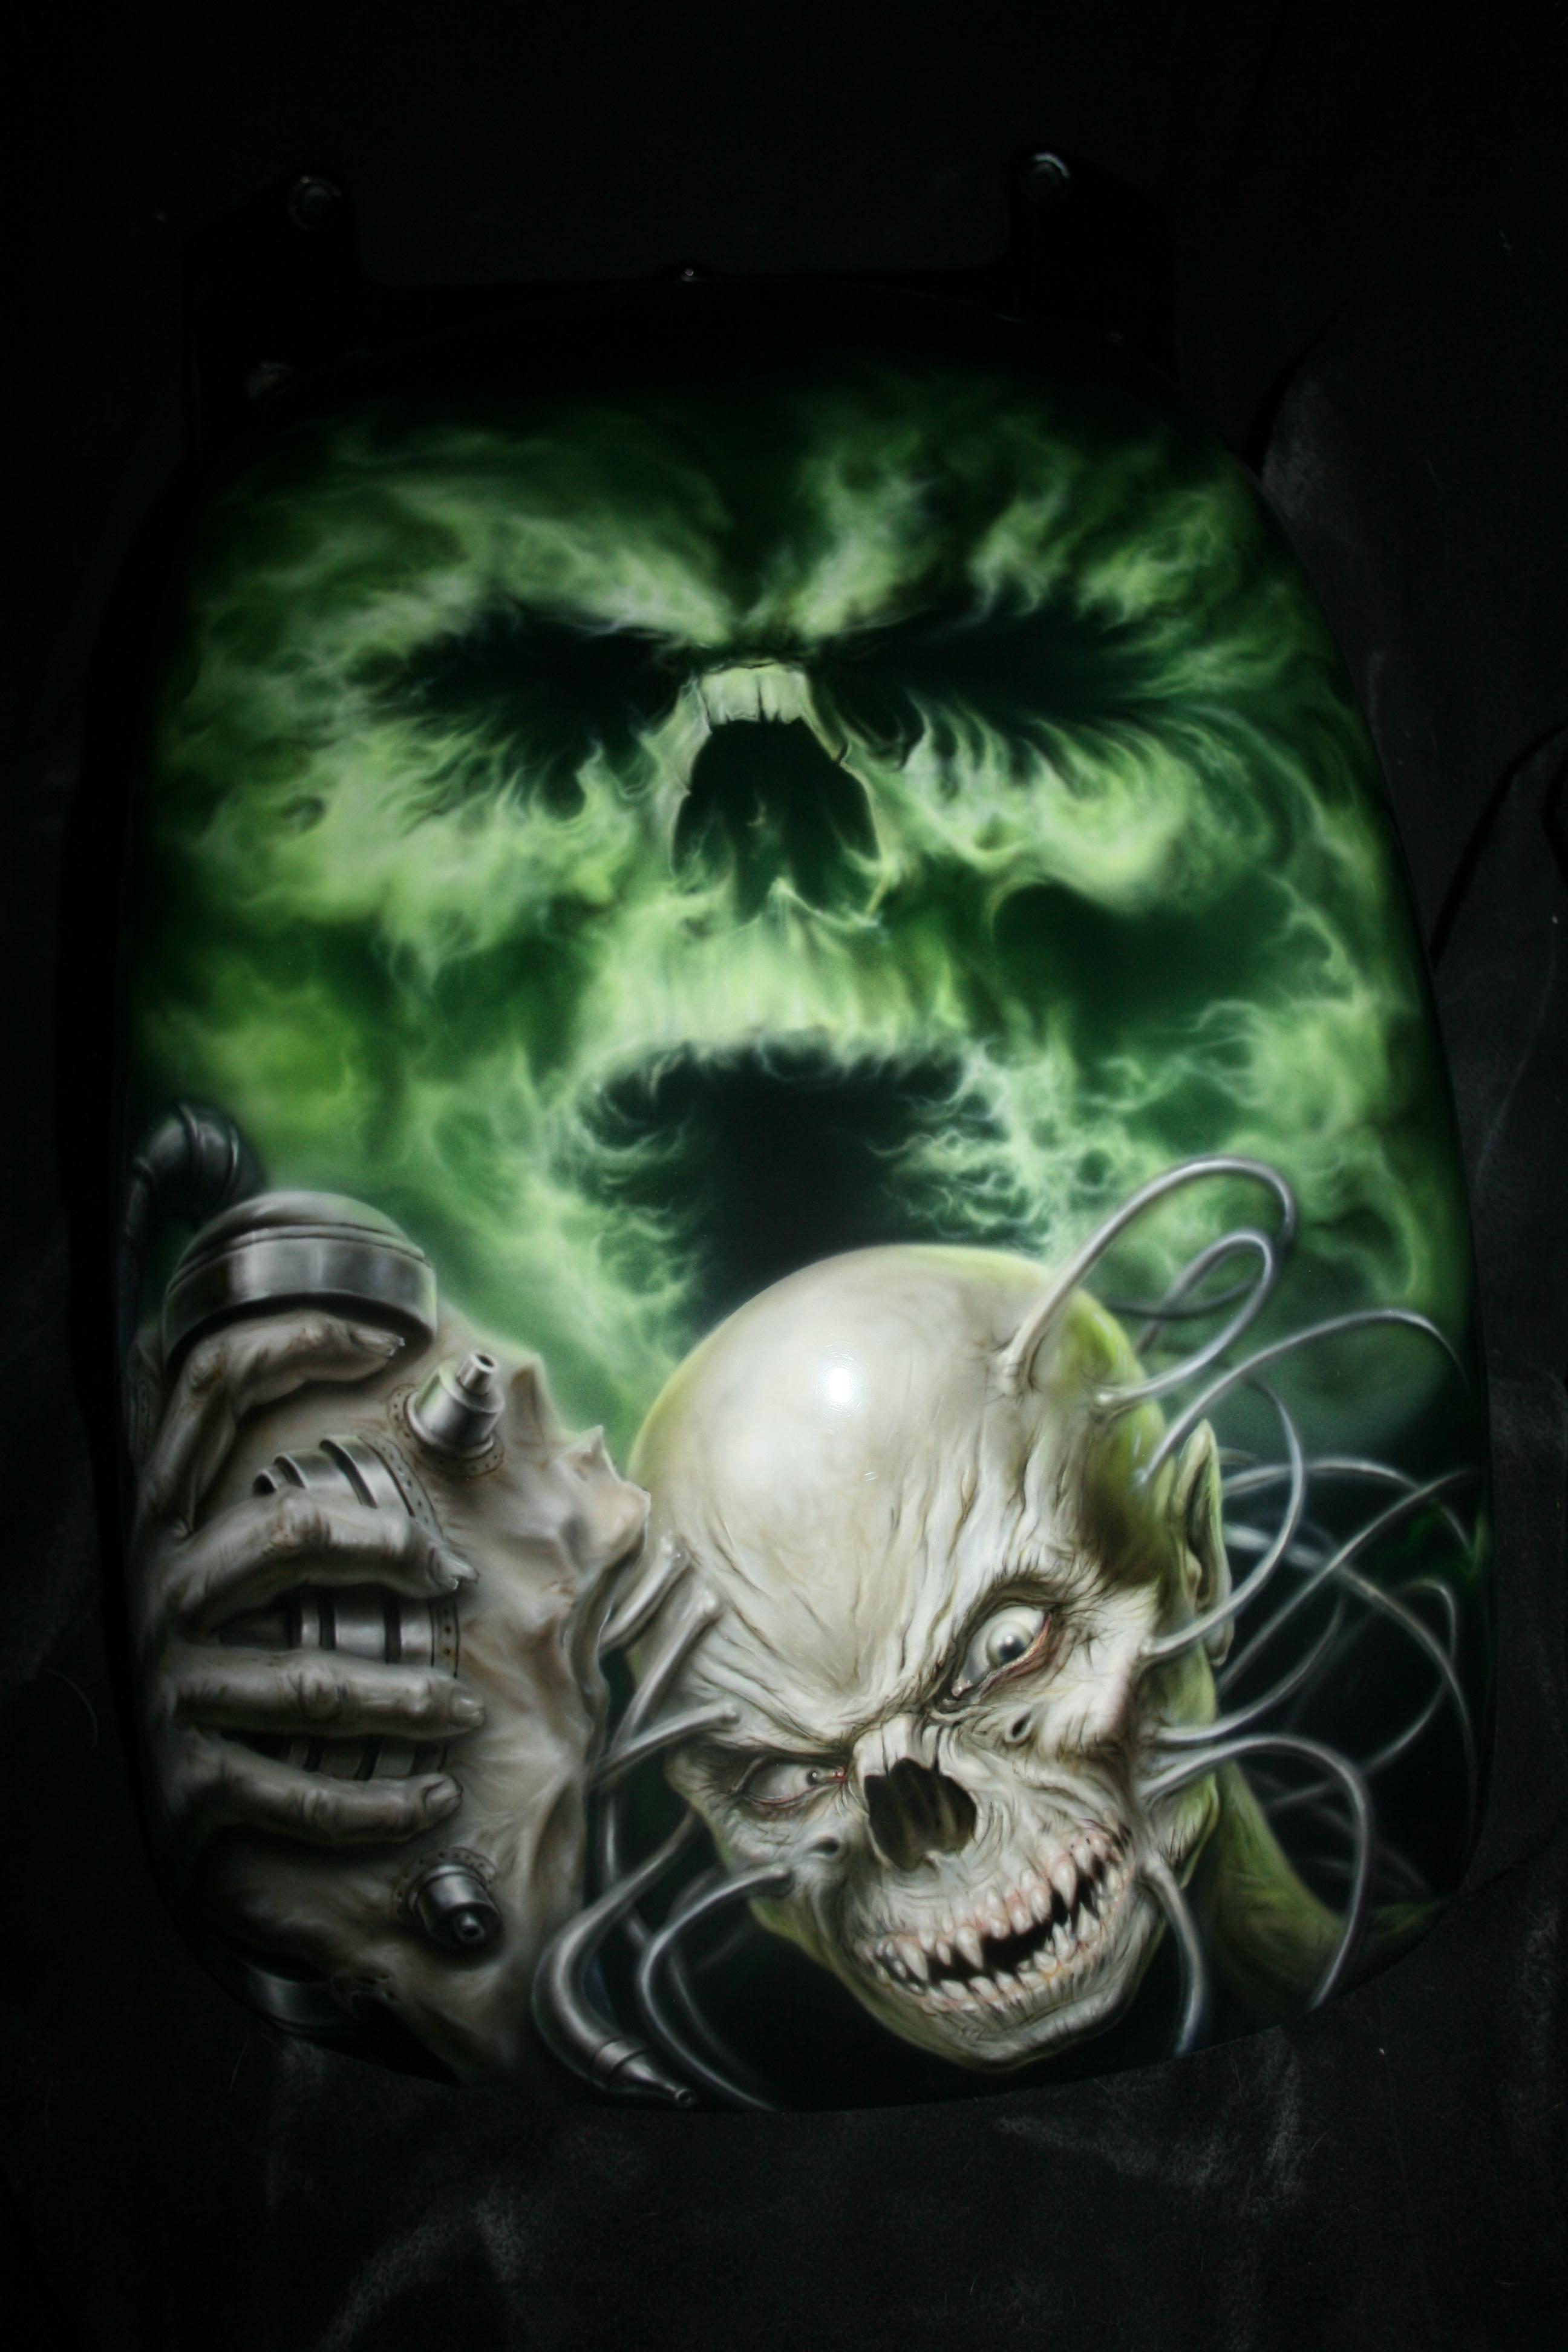 GREEN DEATH 3